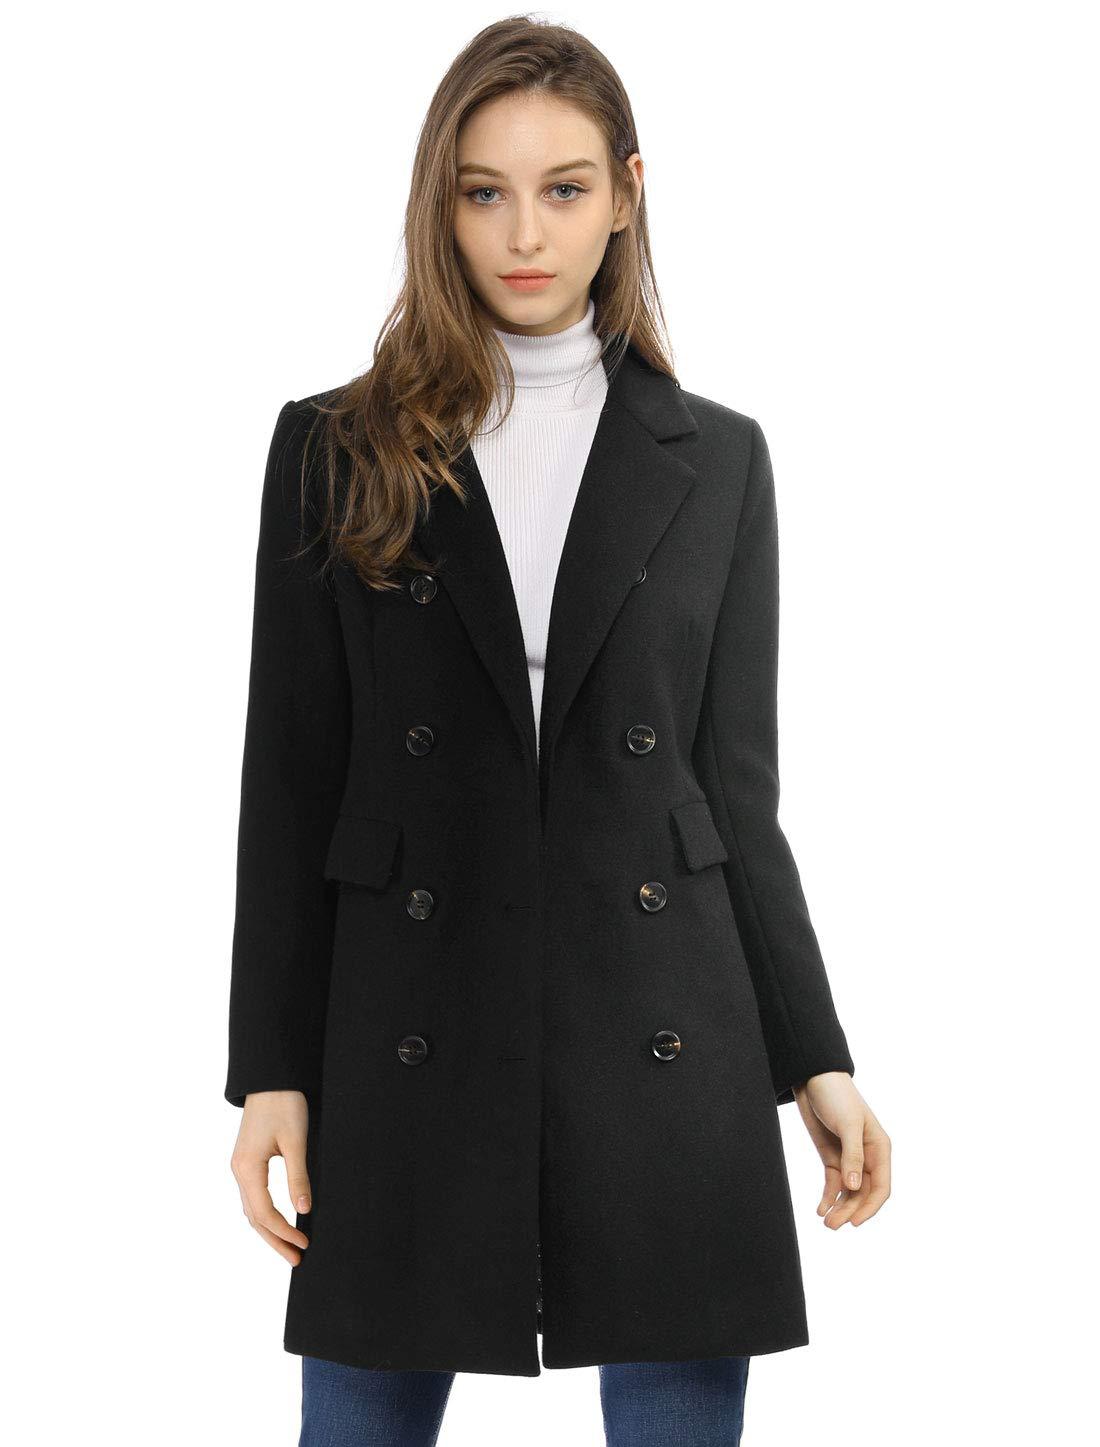 Allegra K Women's Long Jacket Notched Lapel Double Breasted Trench Coat L Blacks by Allegra K